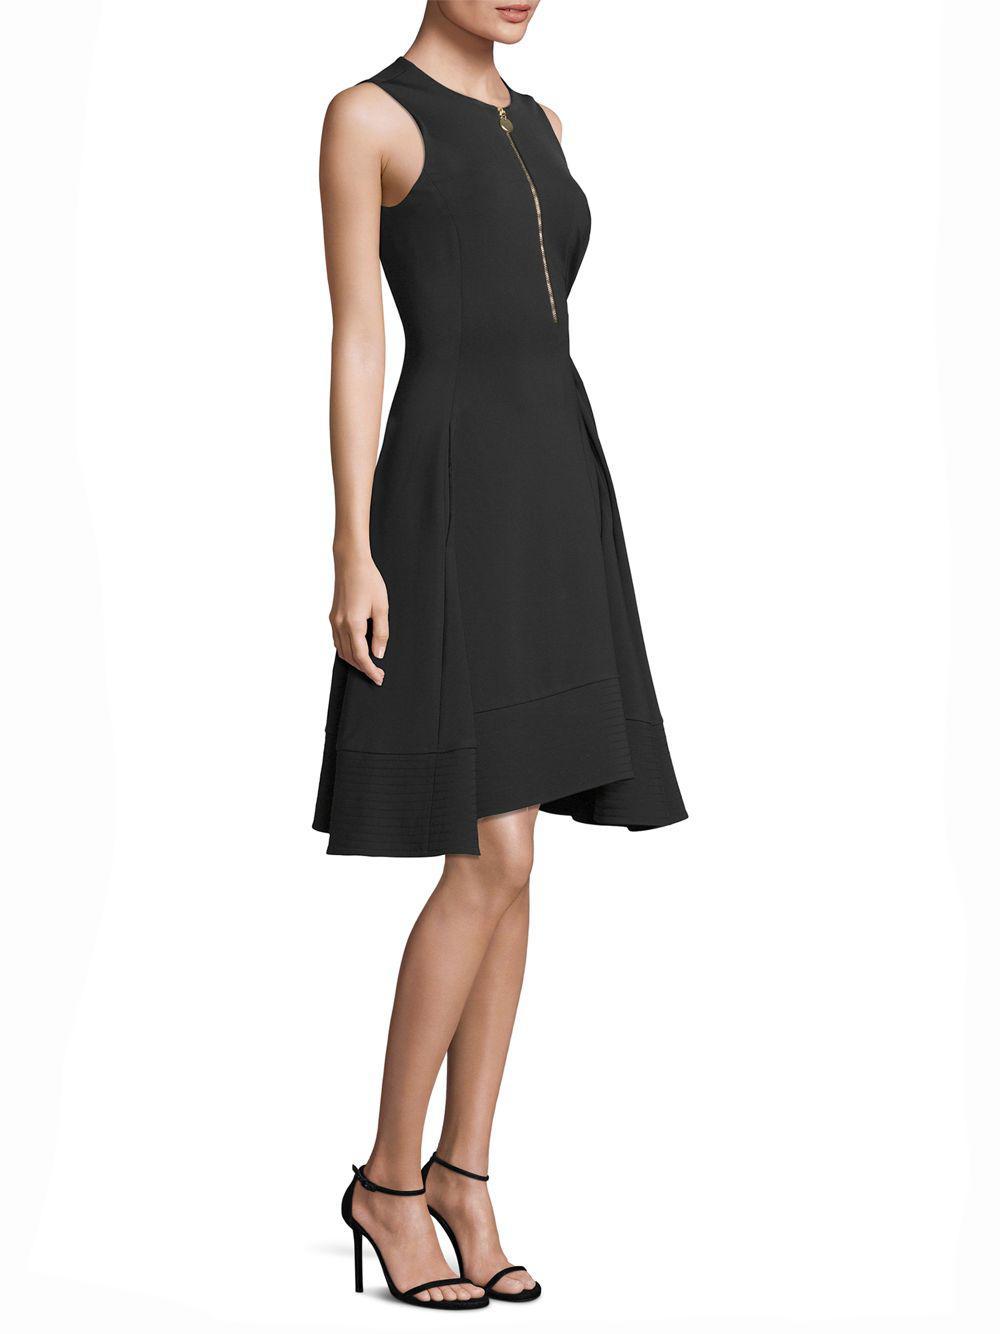 ac6abe03d20c0 Lyst - Donna Karan Sleeveless Fit- -flare Dress in Black - Save 52%